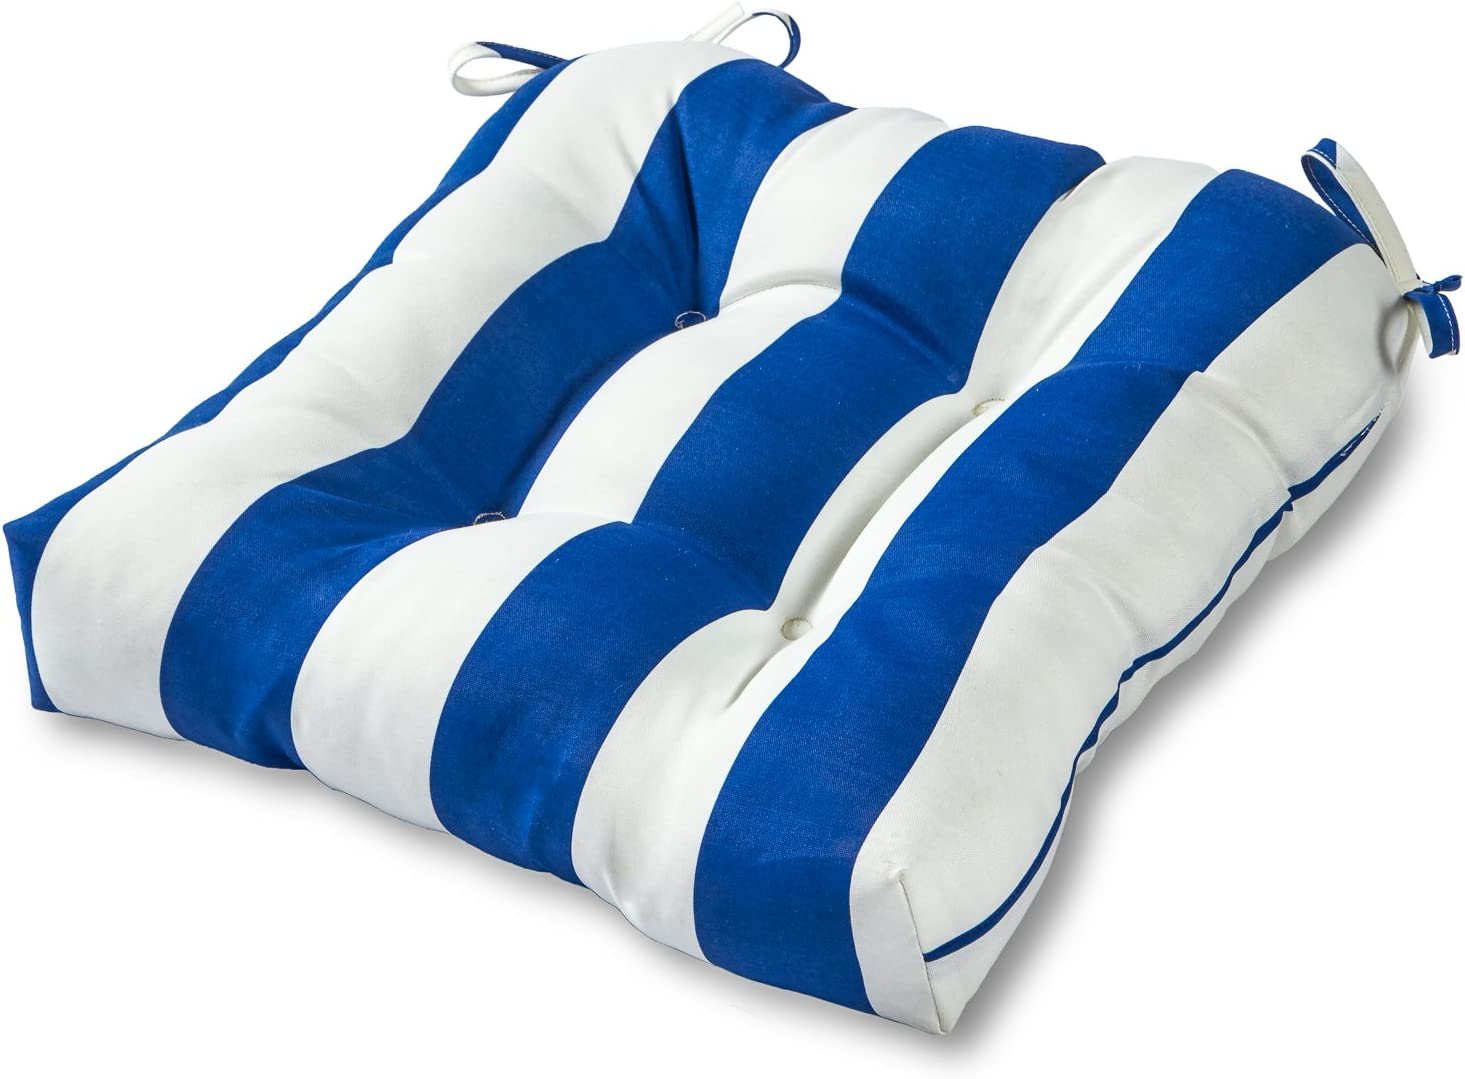 Greendale Home Fashions AZ4800-CABANA-BLUE Bungalow Stripe Blue 20-inch Outdoor Dining Seat Cushion